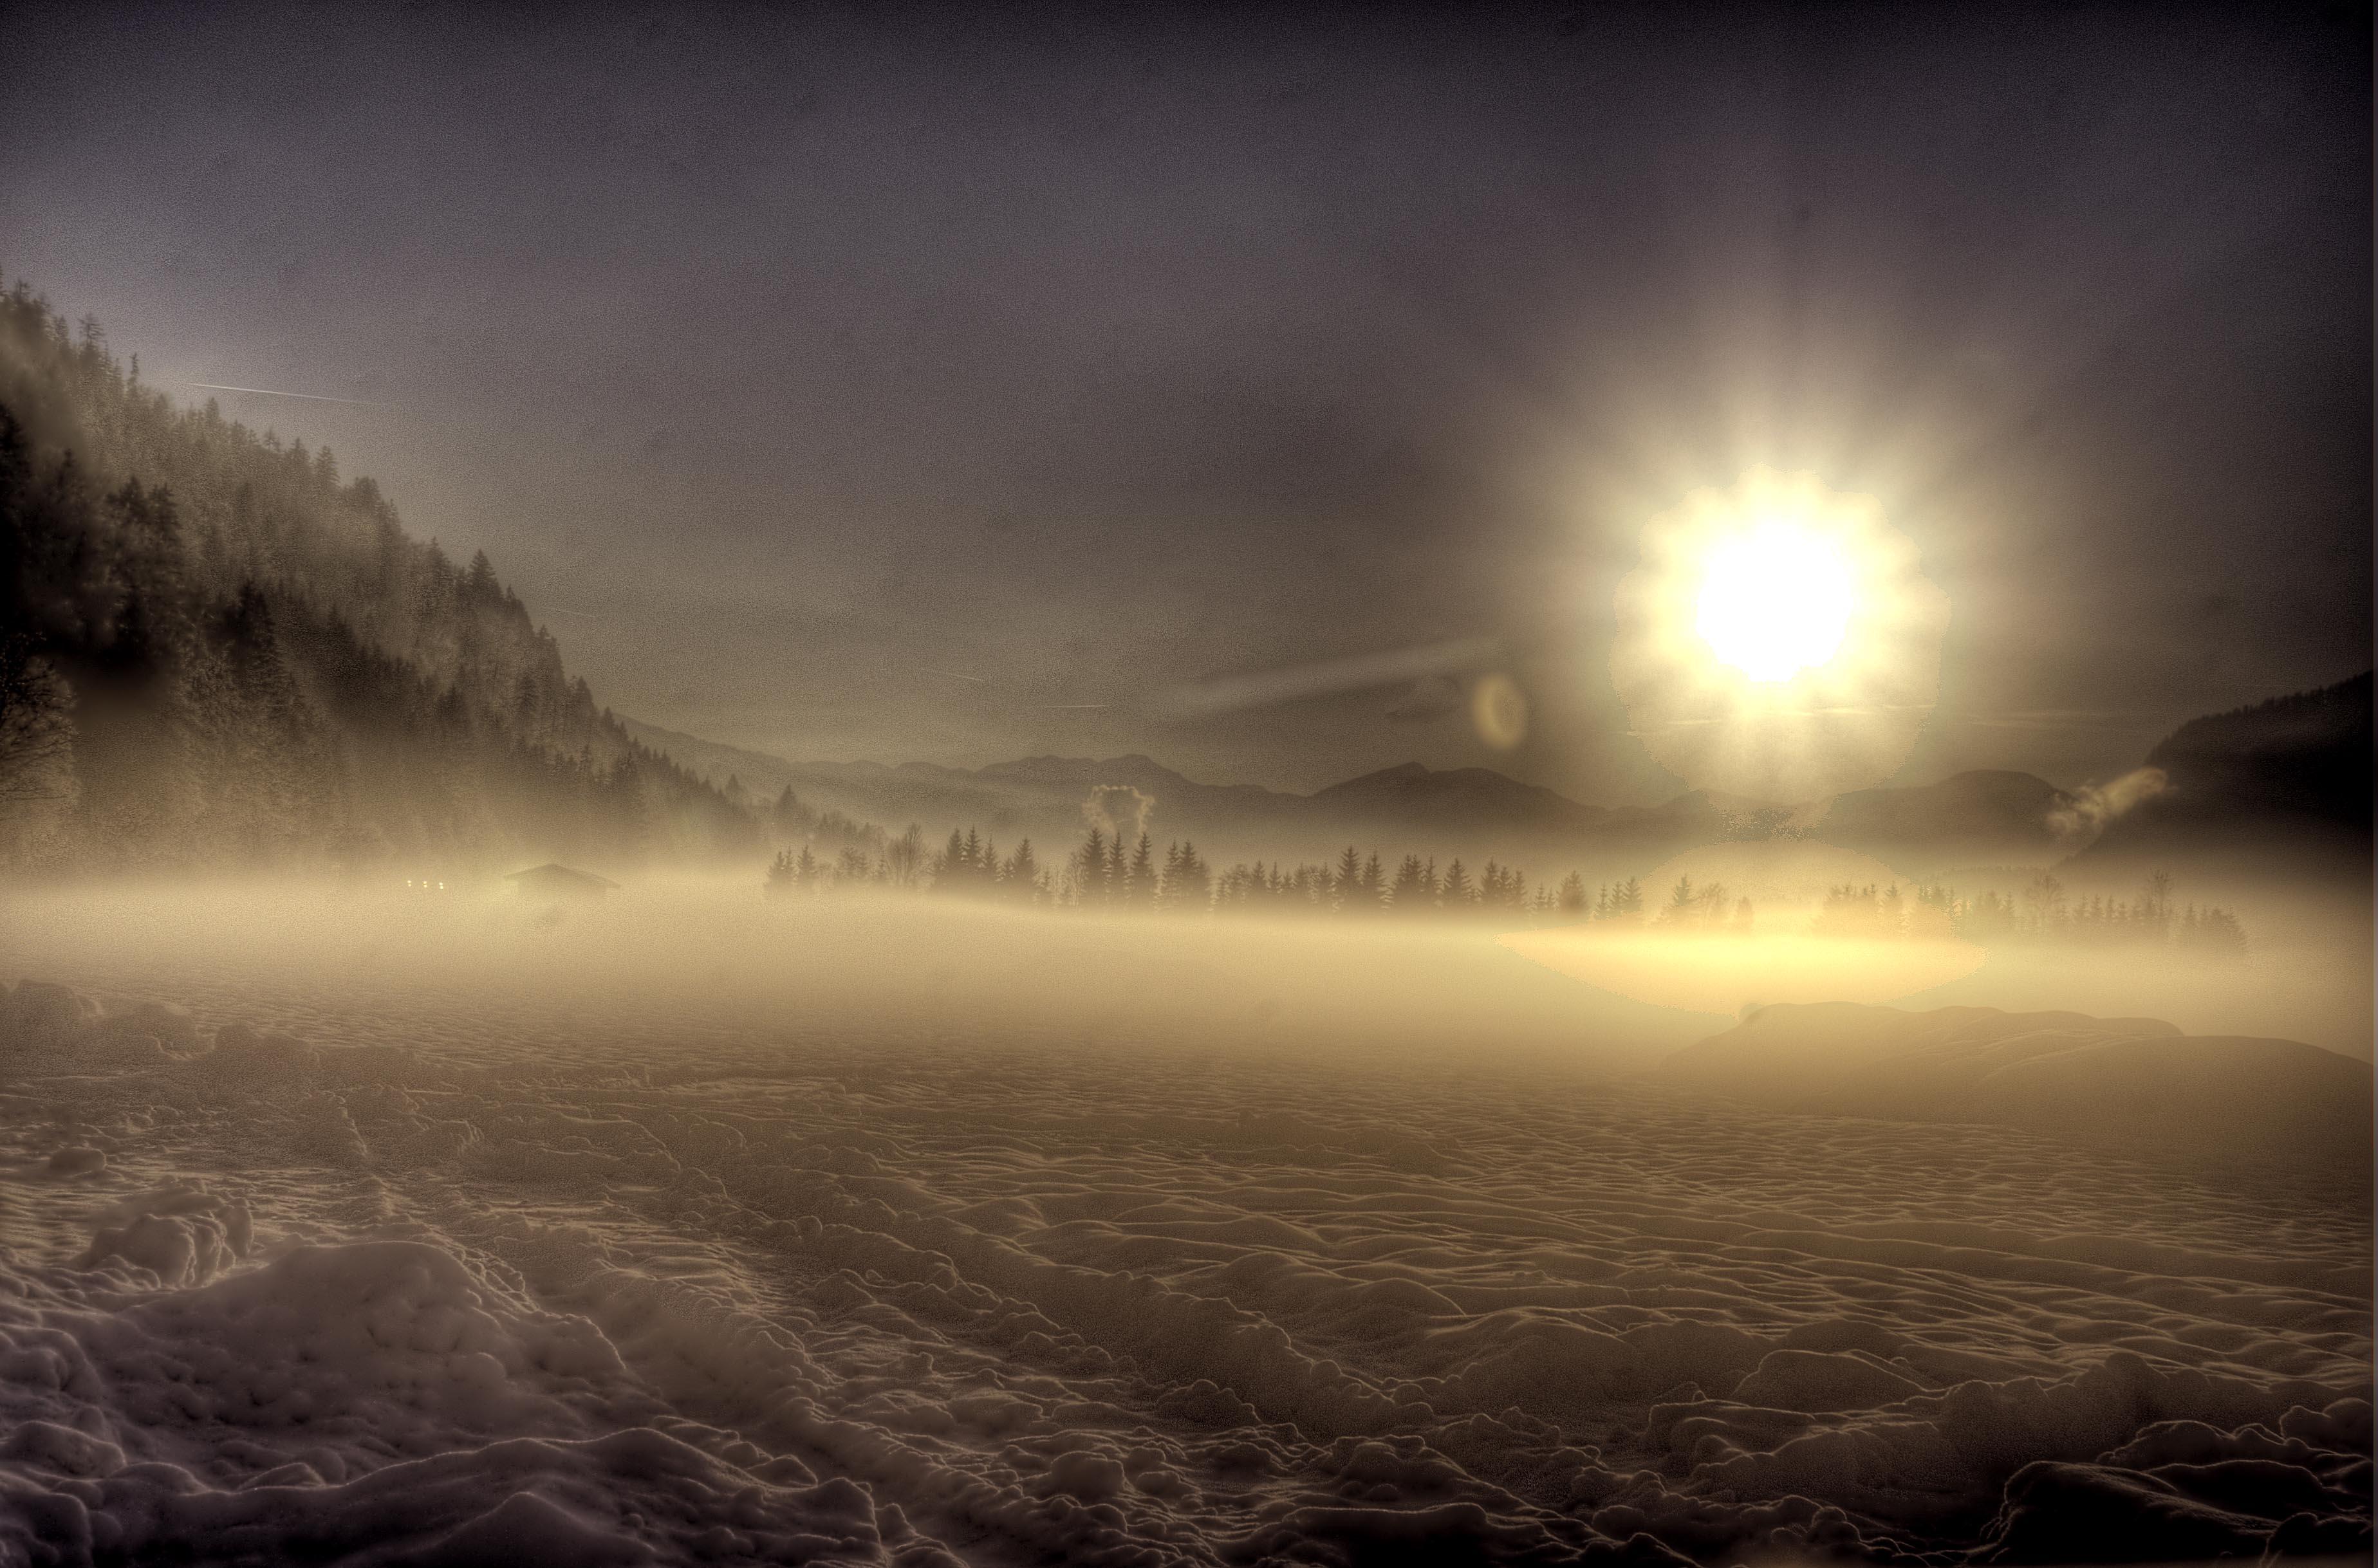 misty valley, St Johann in Tirol